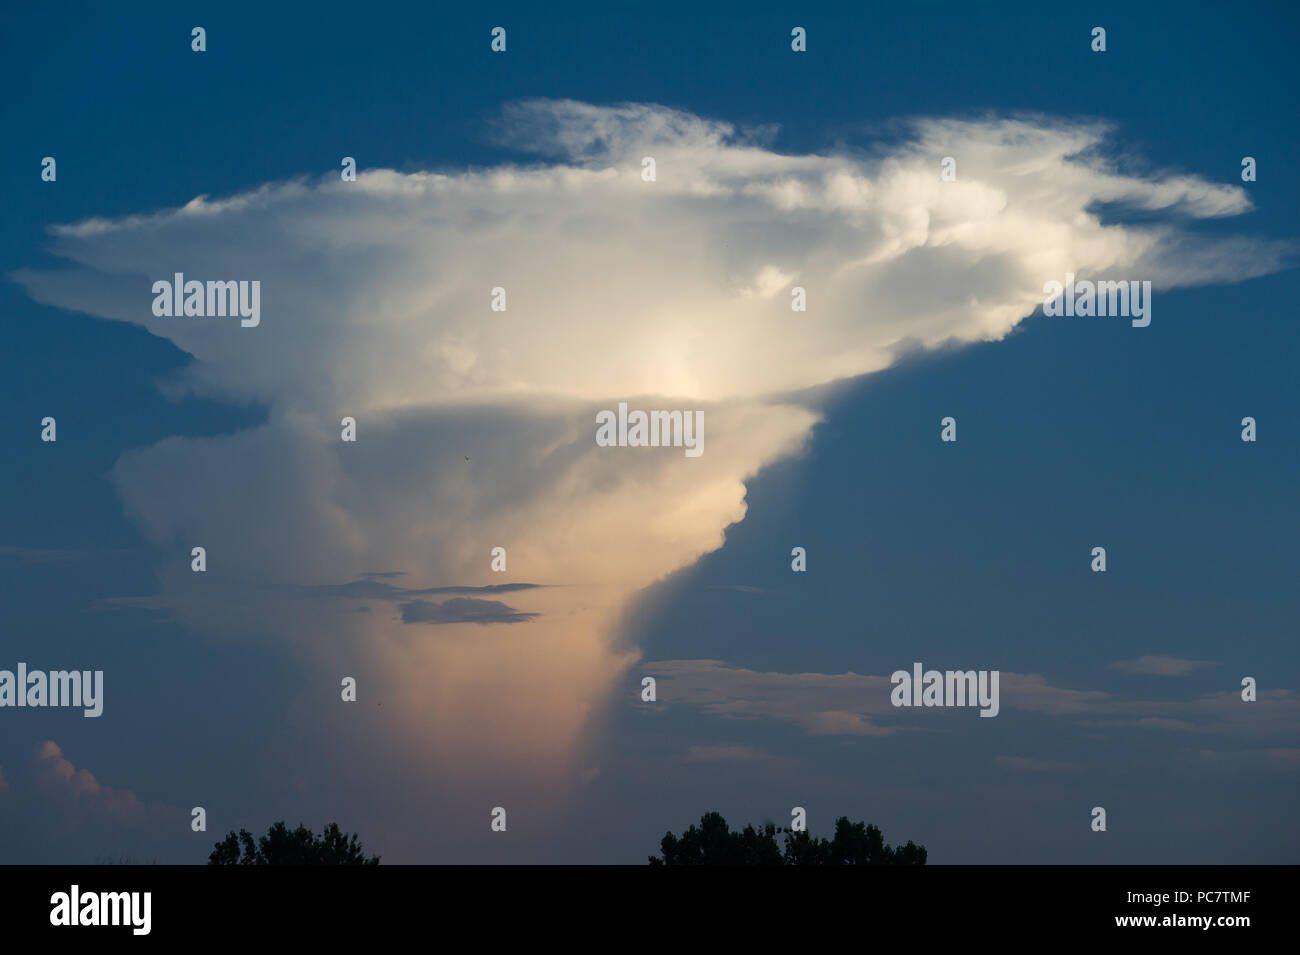 Cumulonimbus cloud in Gdansk, Poland. July 28th 2018 © Wojciech Strozyk / Alamy Stock Photo - Stock Image